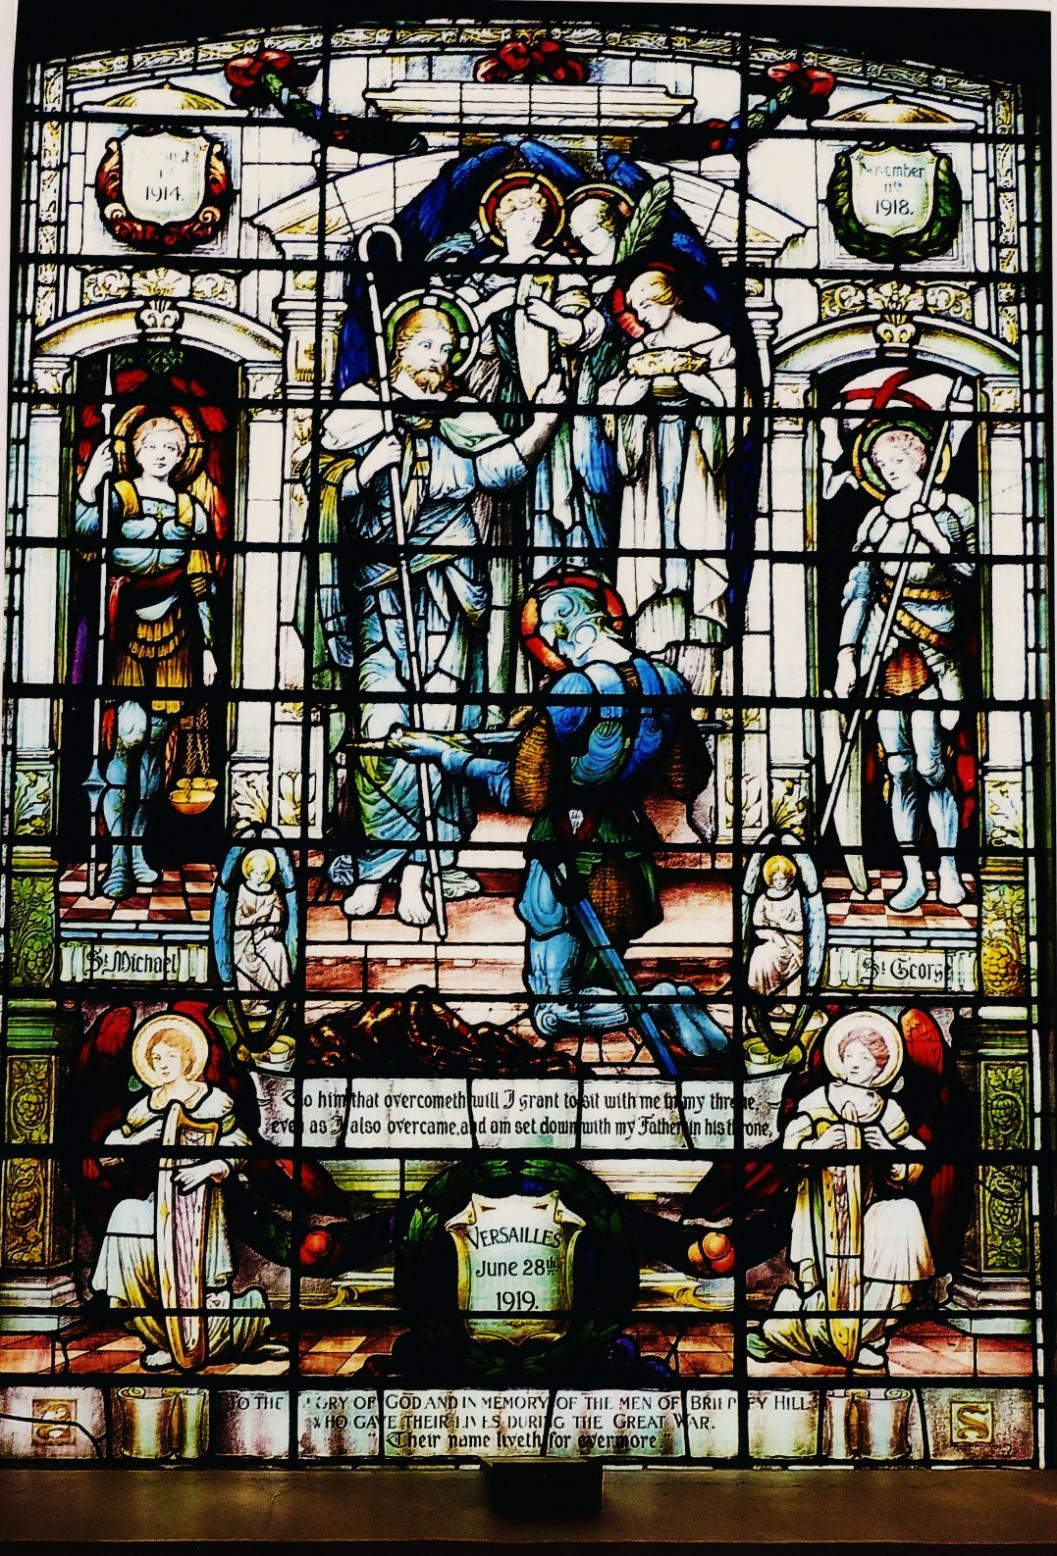 st-michaels-parish-memorial-window_1307154512.jpg